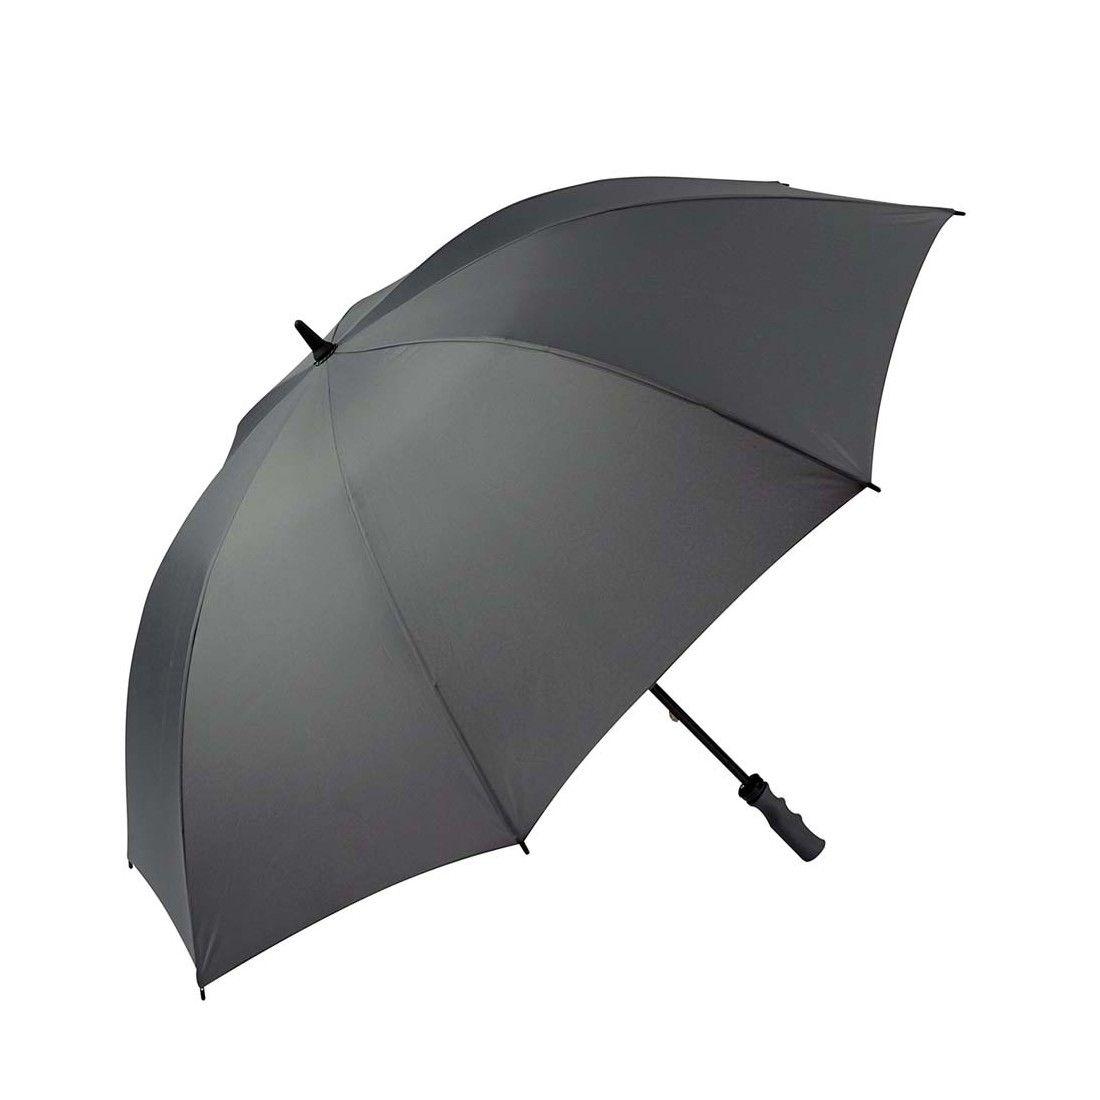 Paraguas 11905 Ezpeleta - 1